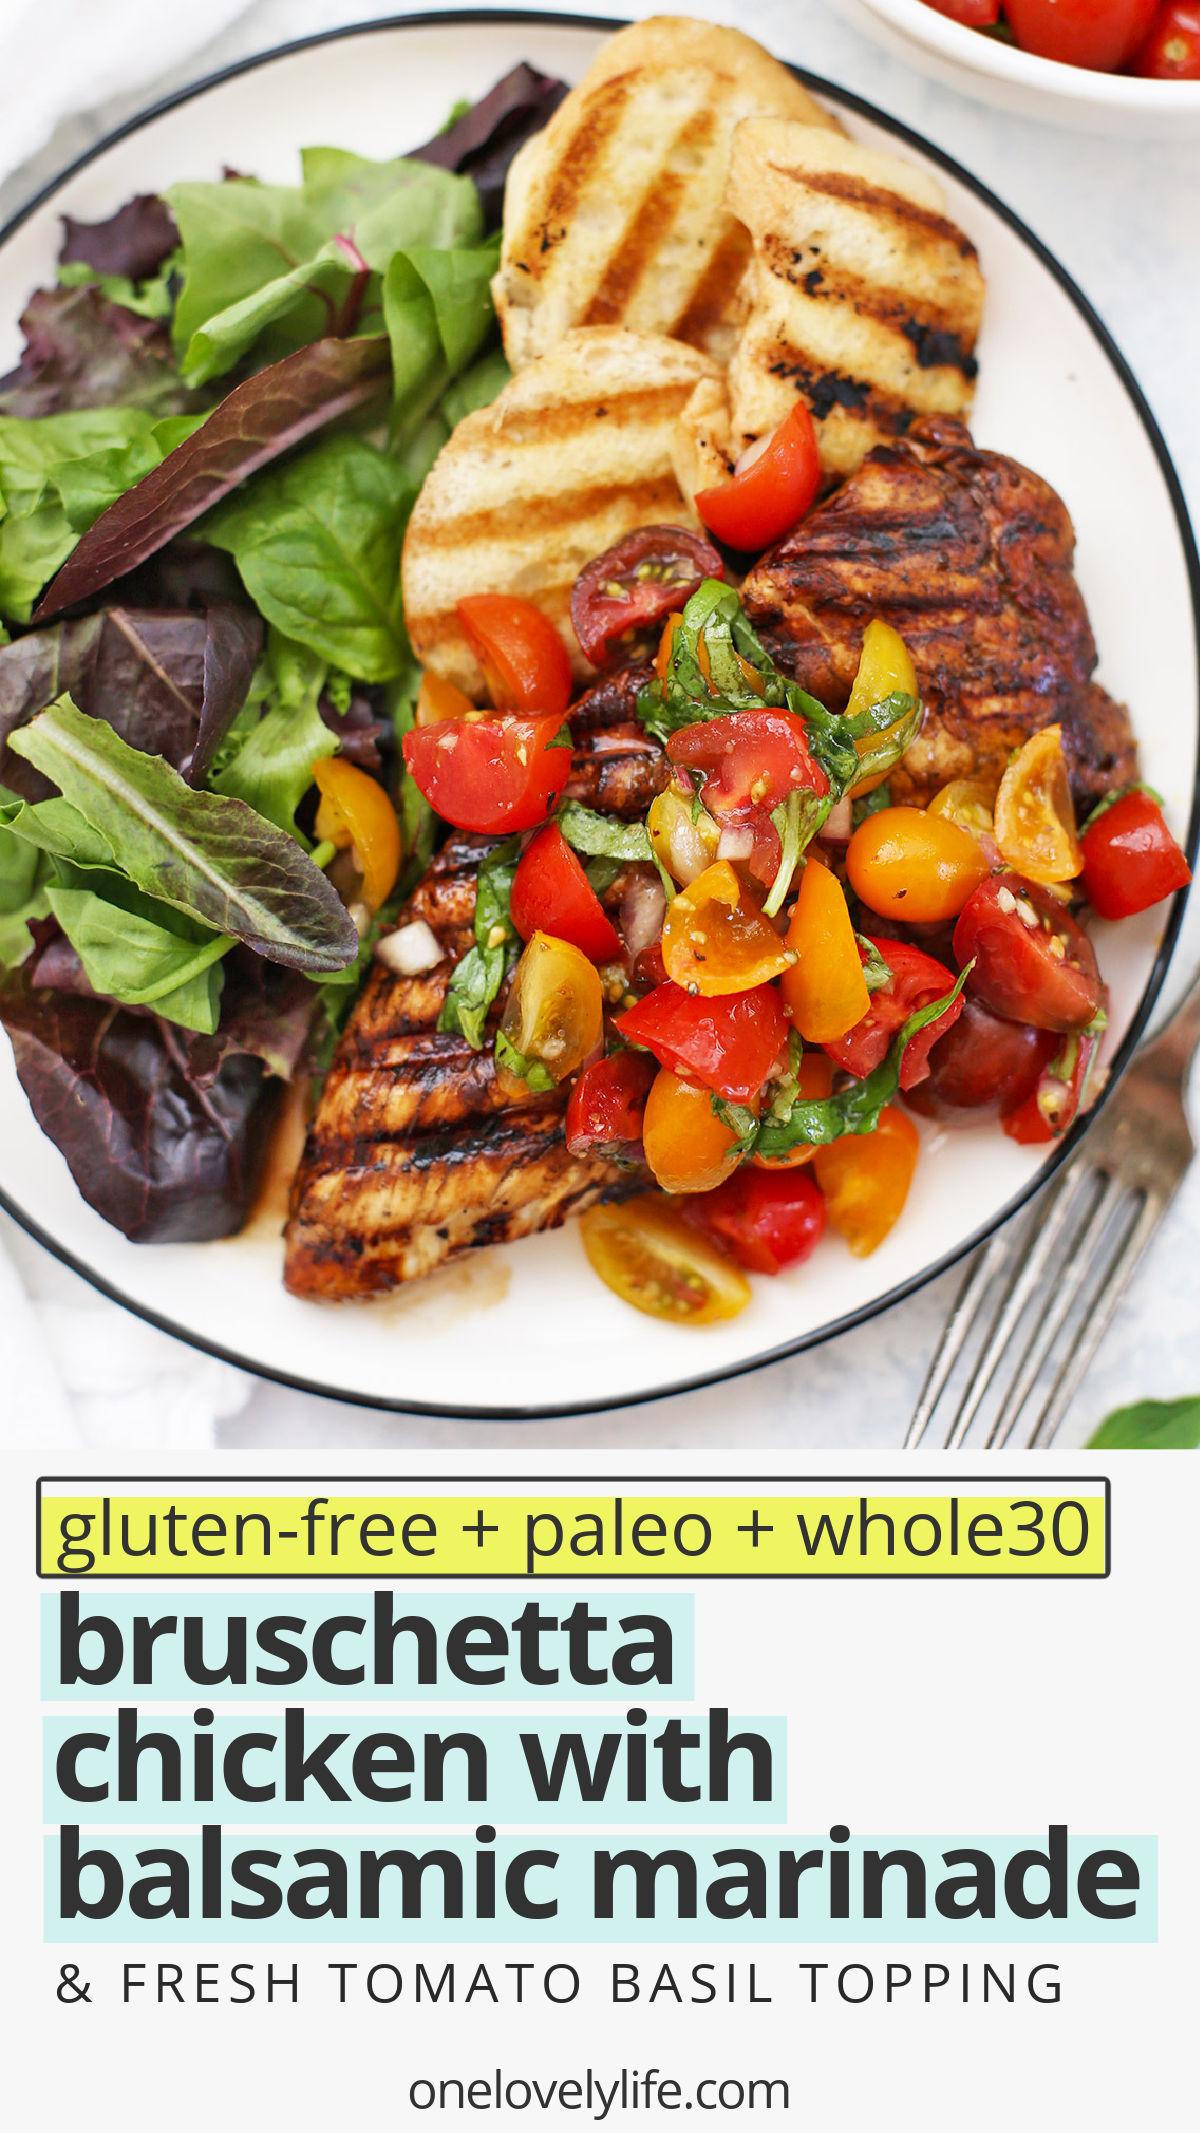 Bruschetta Grilled Chicken - This balsamic grilled chicken is topped with a fresh tomato basil bruschetta topping. I love the balsamic marinade! (Paleo, Gluten Free) // Healthy Dinner // Bruschetta Chicken Recipe // Balsamic Chicken Marinade // Summer Recipe #summerrecipe #grilledchicken #healthydinner #paleo #glutenfree